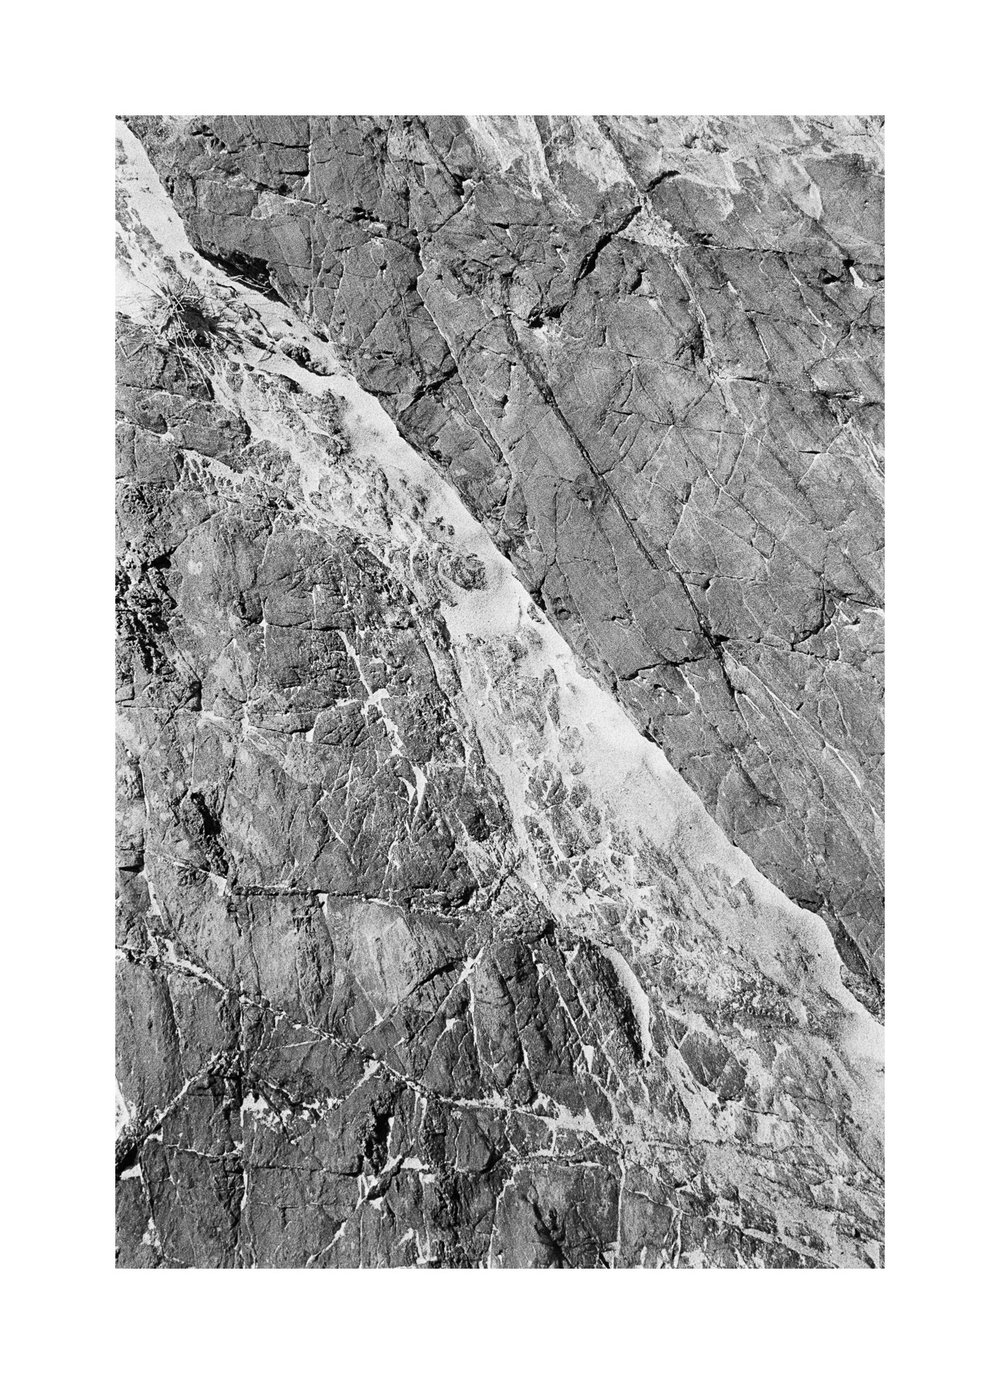 20181103 - Roll 263 - 029-Nick-Bedford,-Photographer-Black and White, Currumbin Rocks, Kodak TRI-X 400, Leica M7, Seascape, Voigtlander 35mm F1.7.jpg